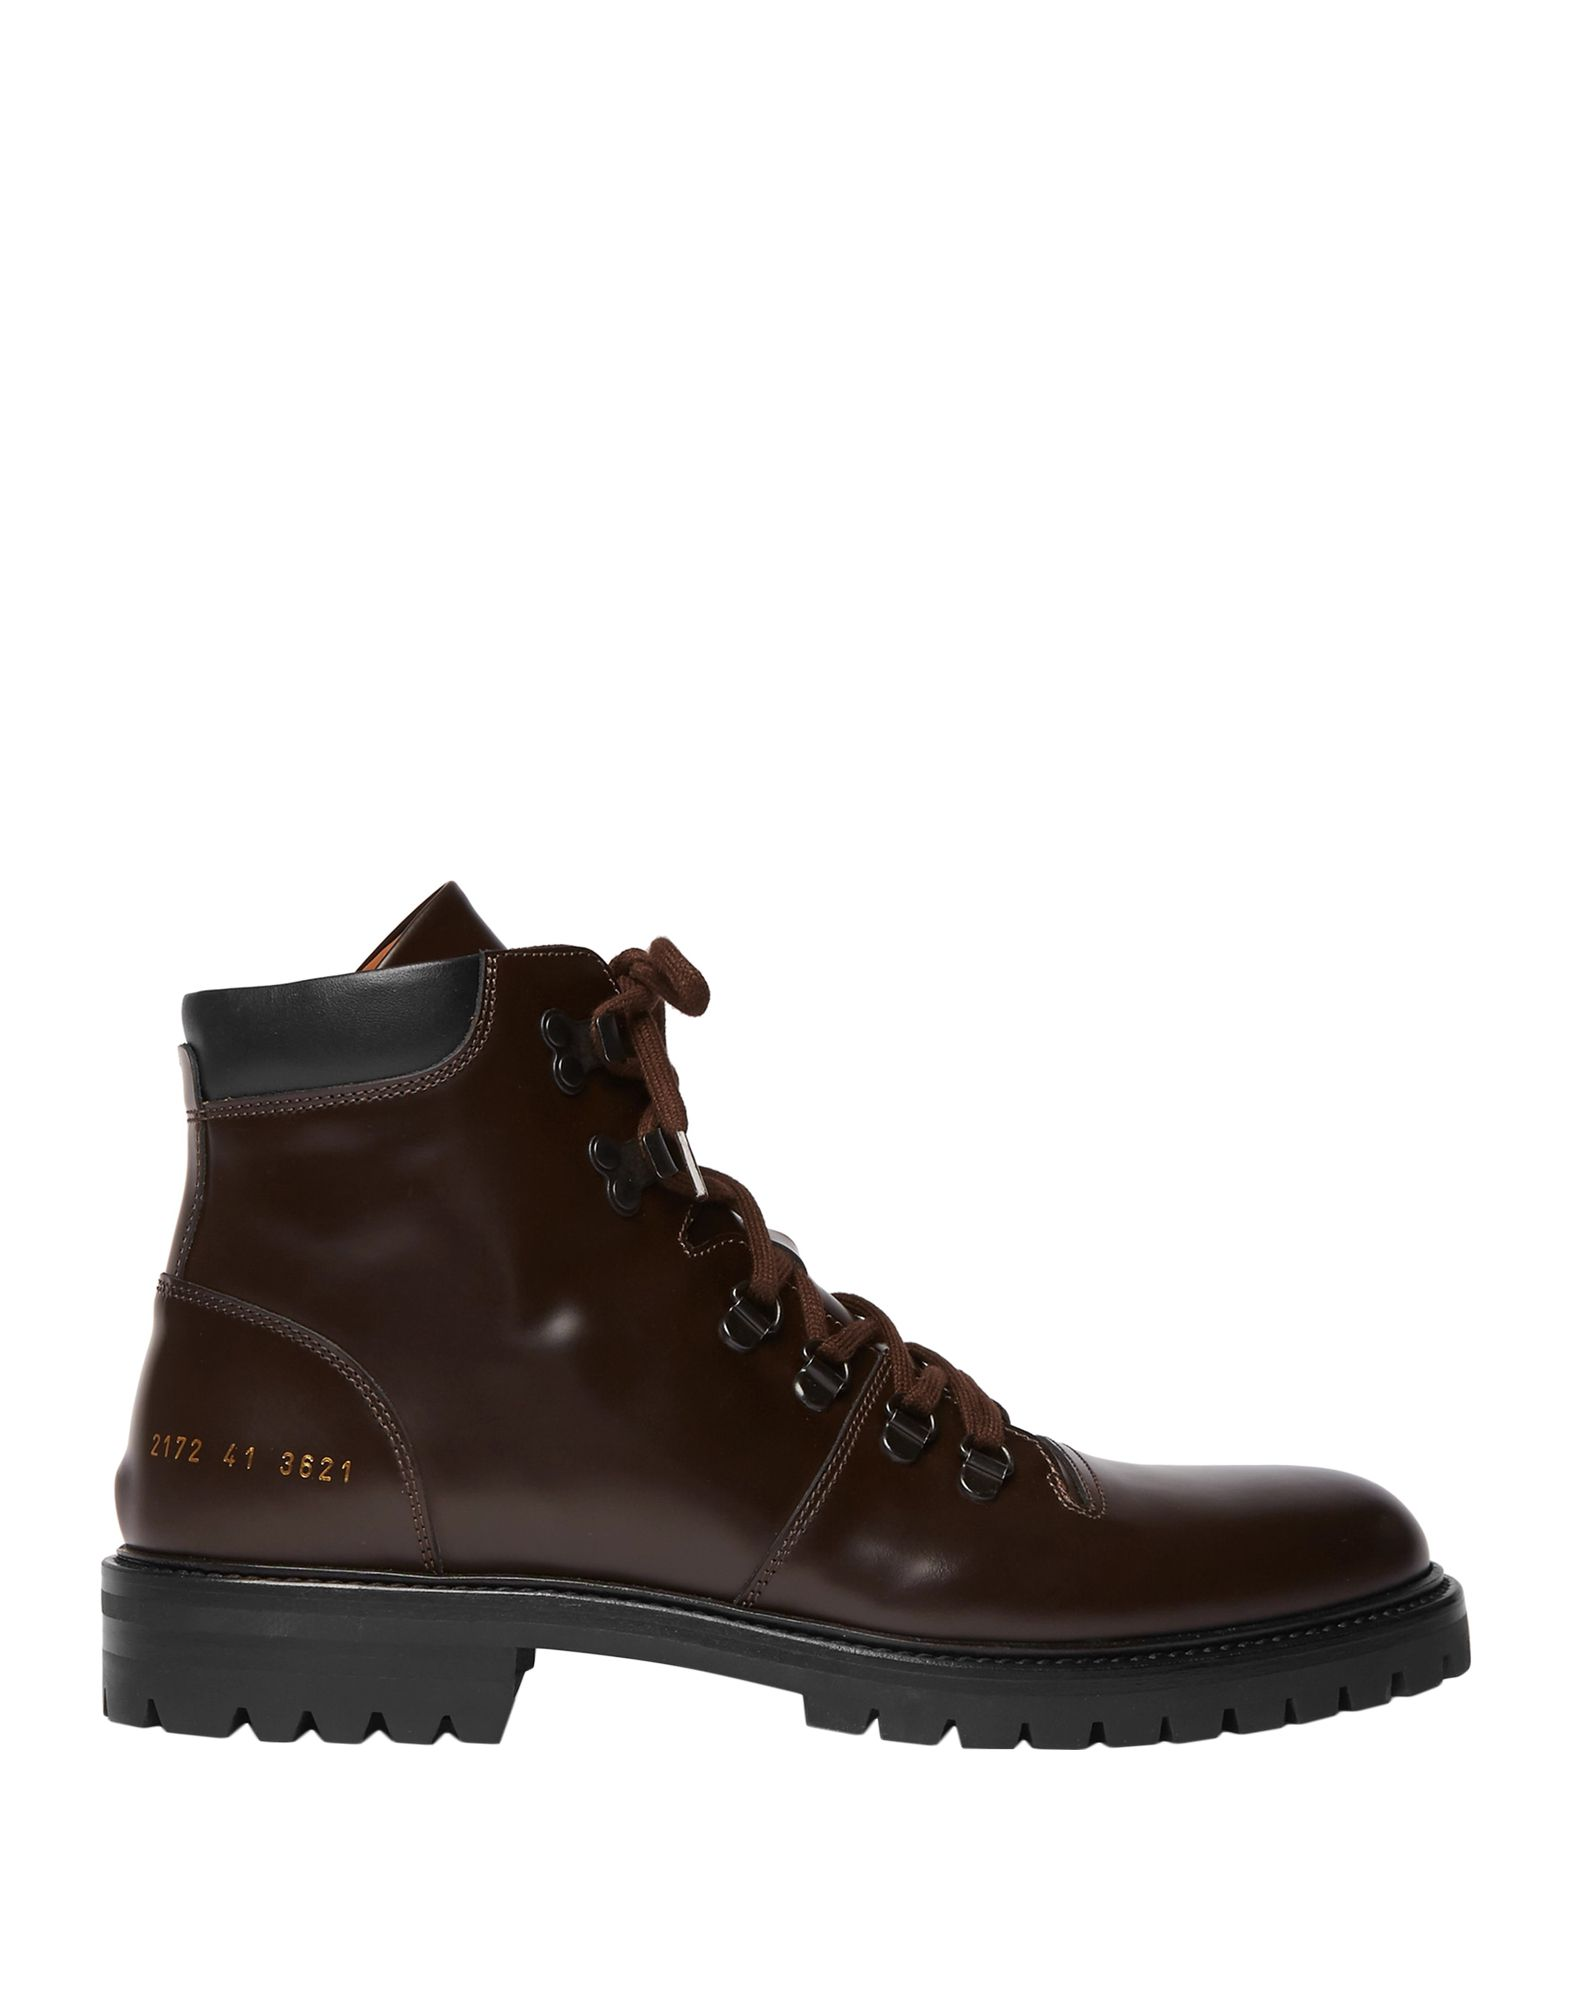 COMMON PROJECTS Полусапоги и высокие ботинки демисезонные ботинки common projects obscure achilles mesh low grey page 2